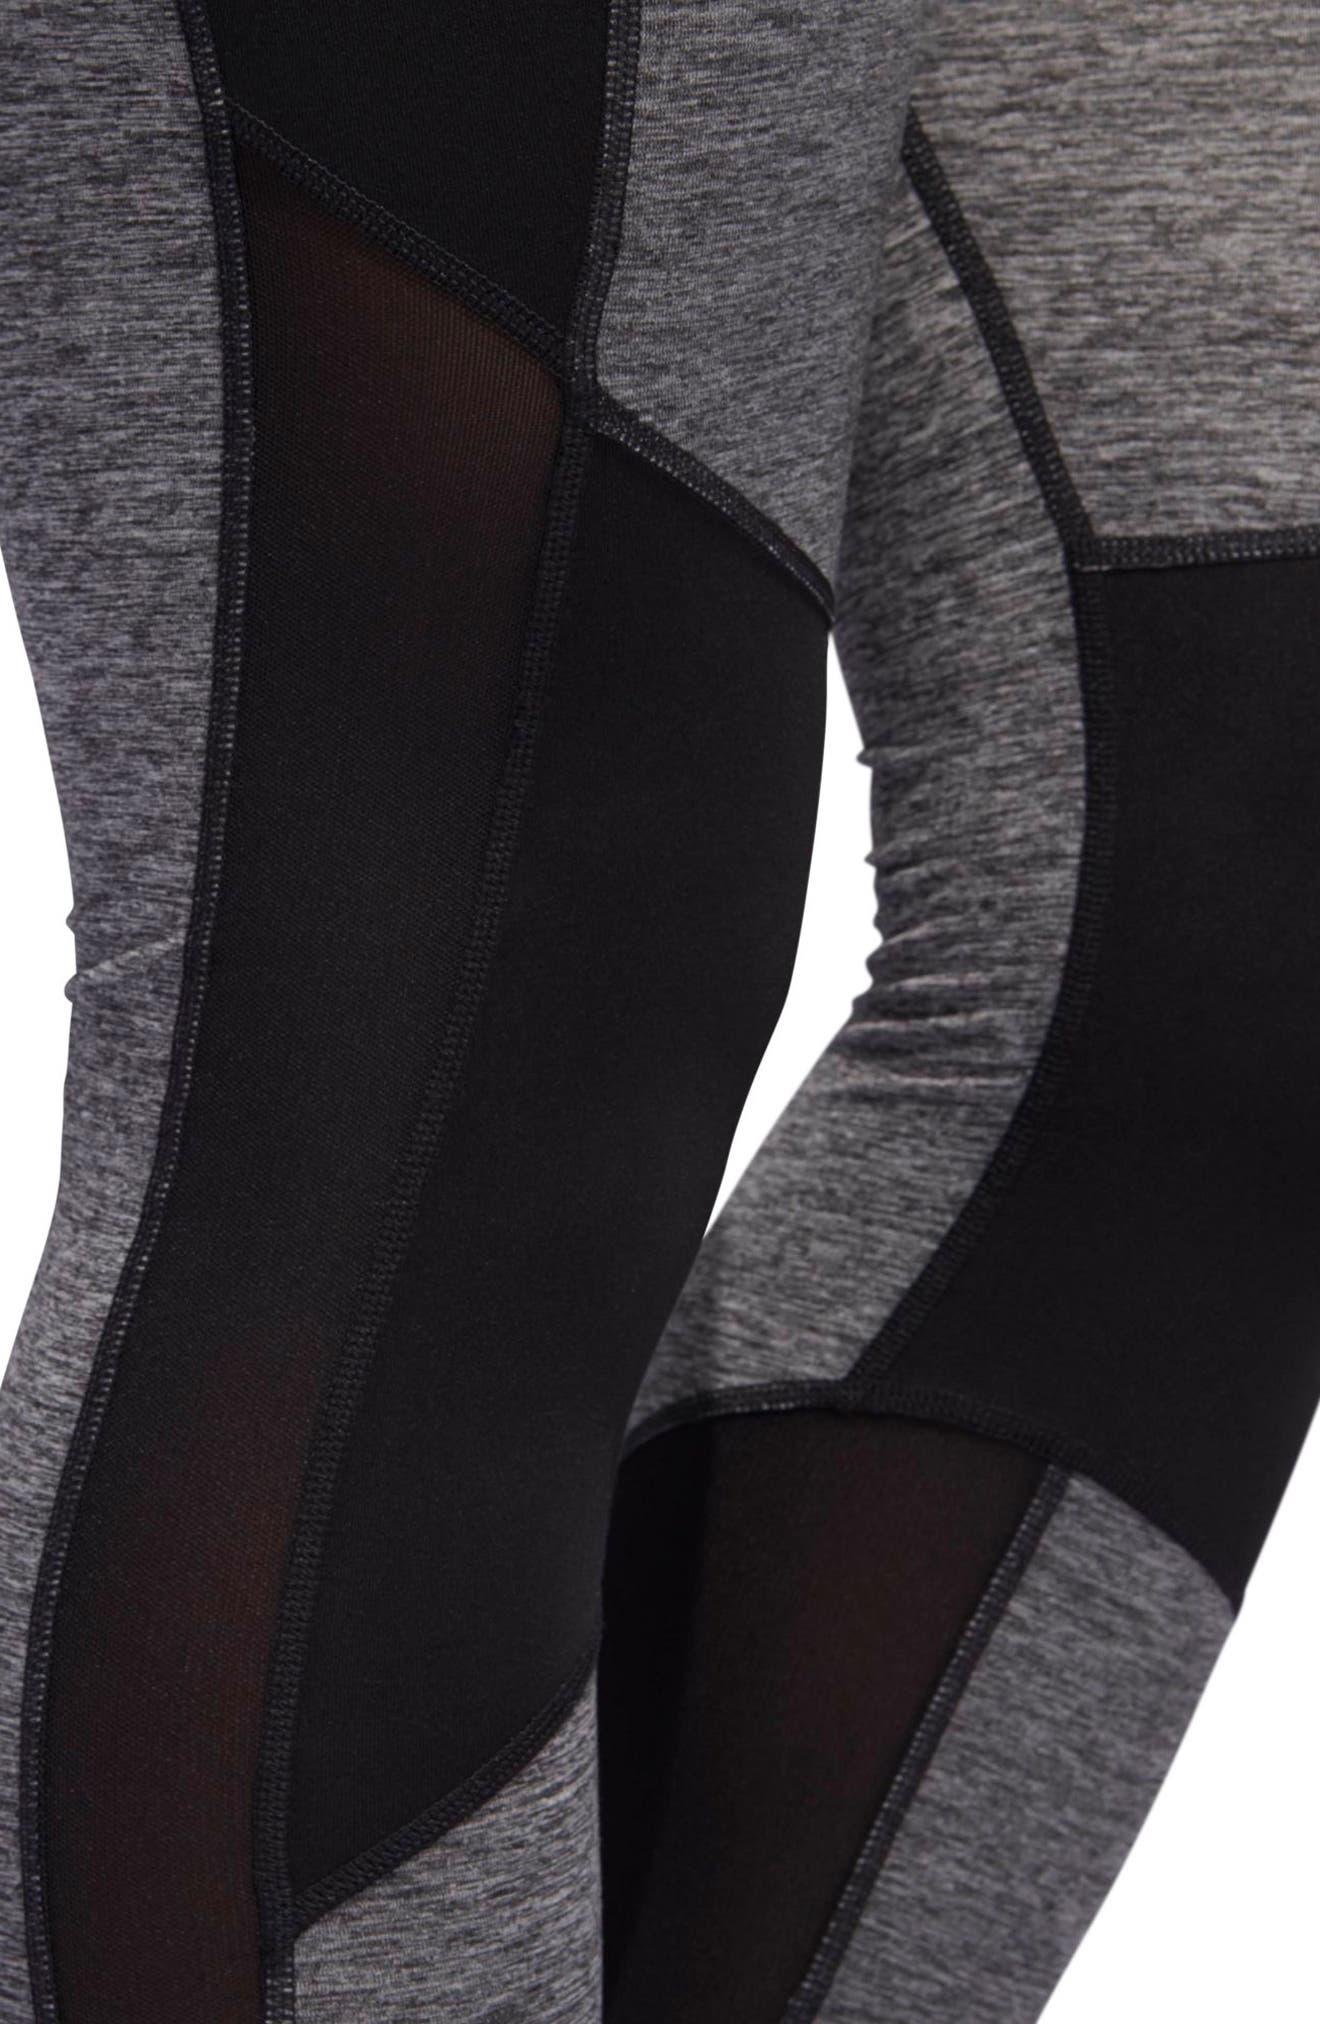 VFA Climalite<sup>®</sup> High Waist Tights,                             Alternate thumbnail 7, color,                             Black